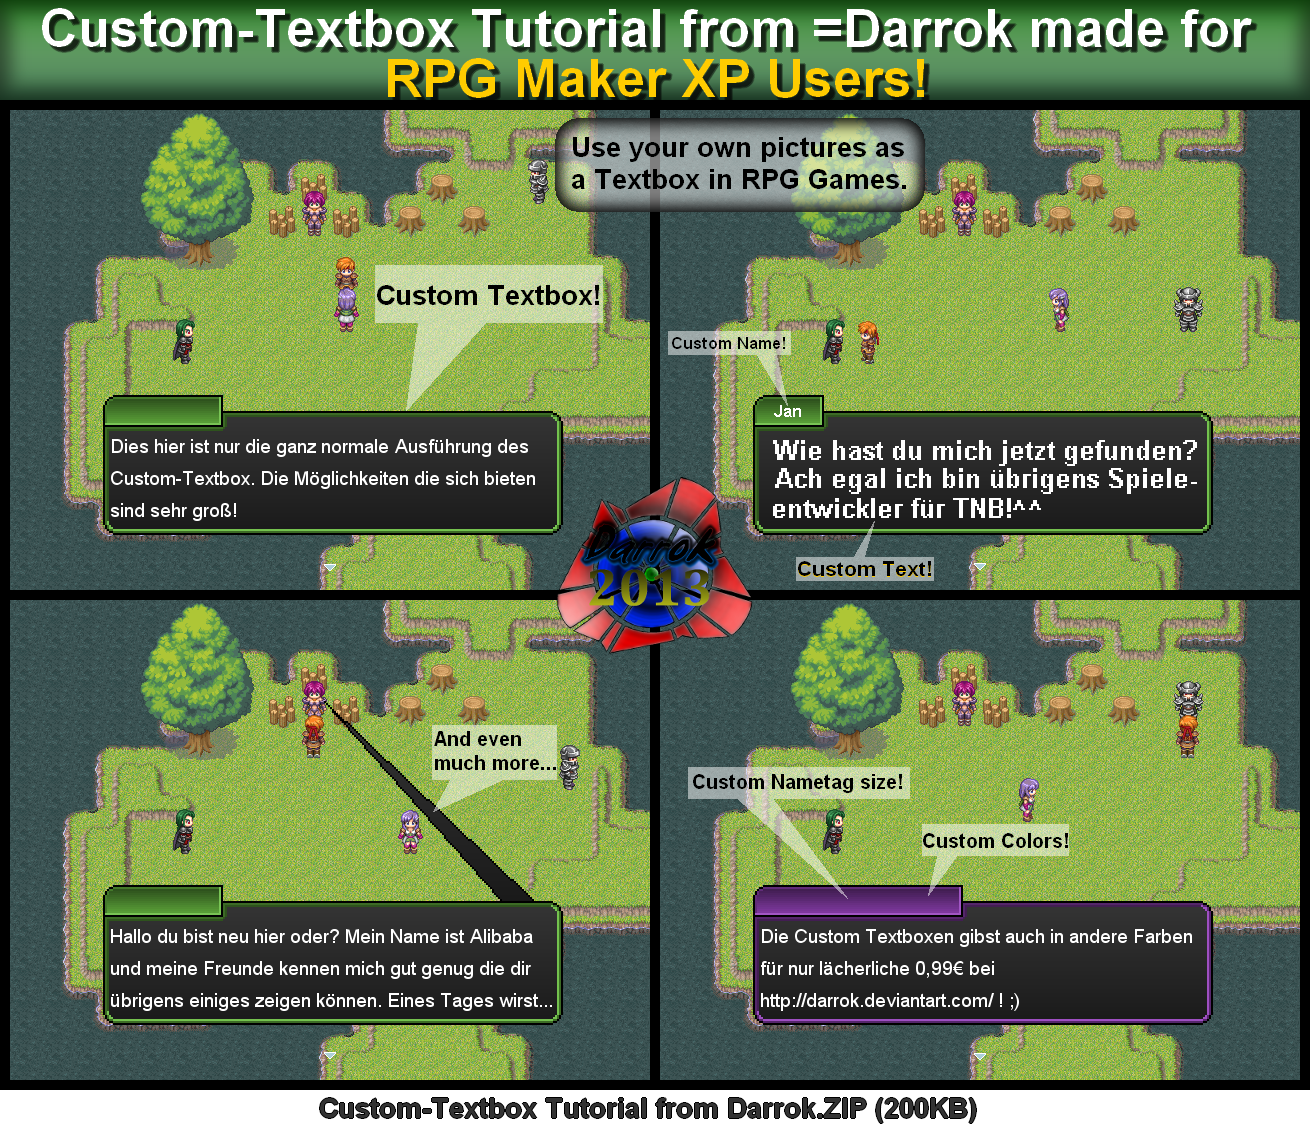 rpg maker xp tutorial